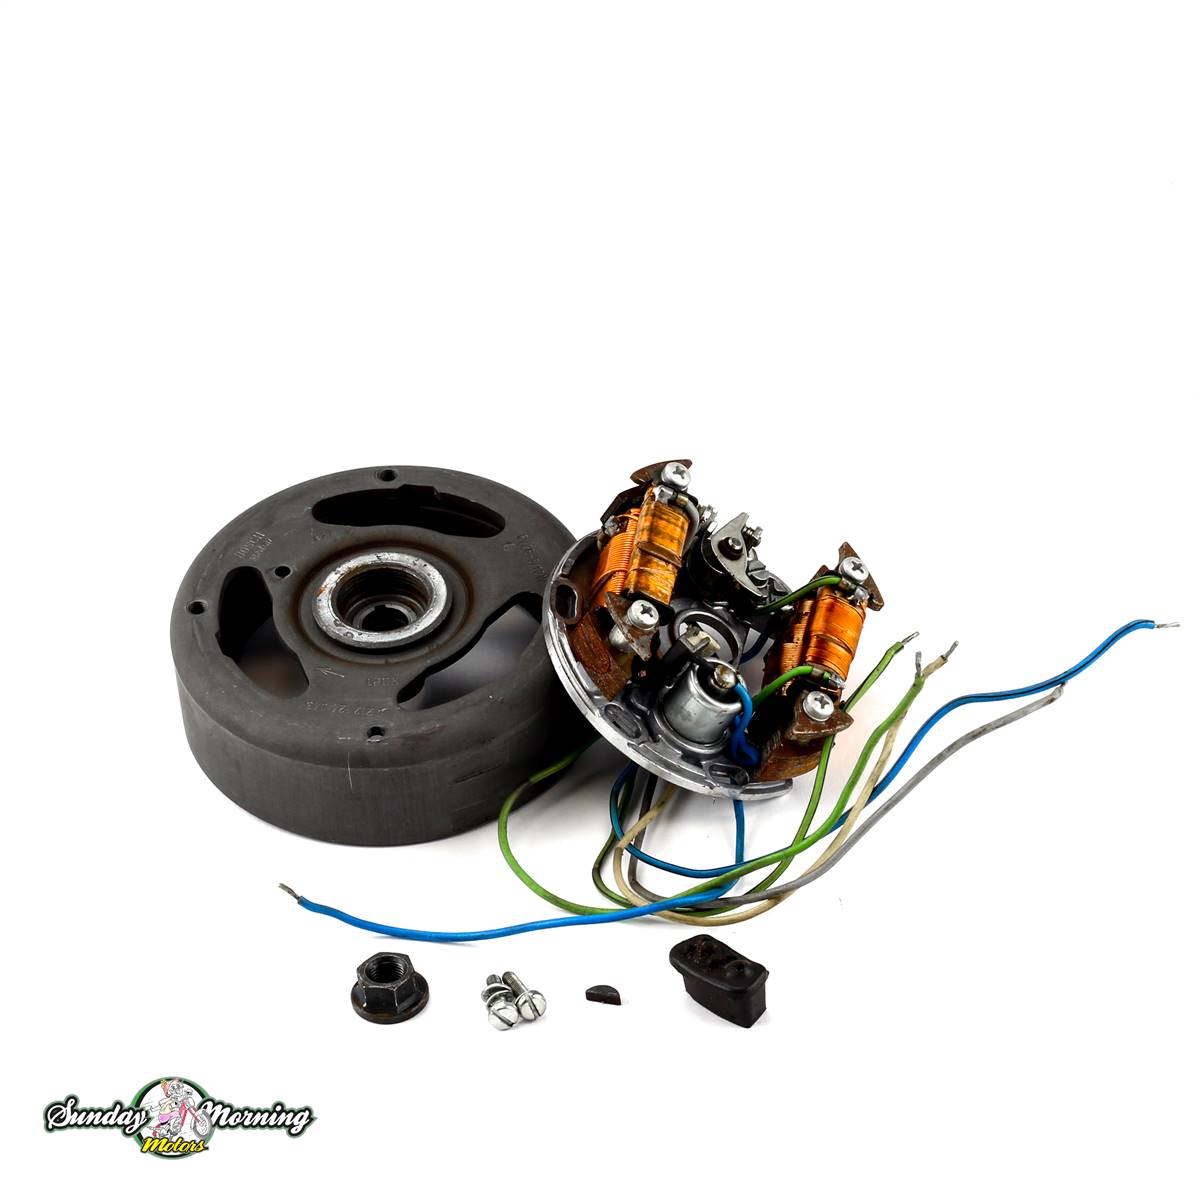 puch moped e50 6 wire magneto assembly complete rh chzbx xpvut servertrust com E50 Tank Cable De Poder E50